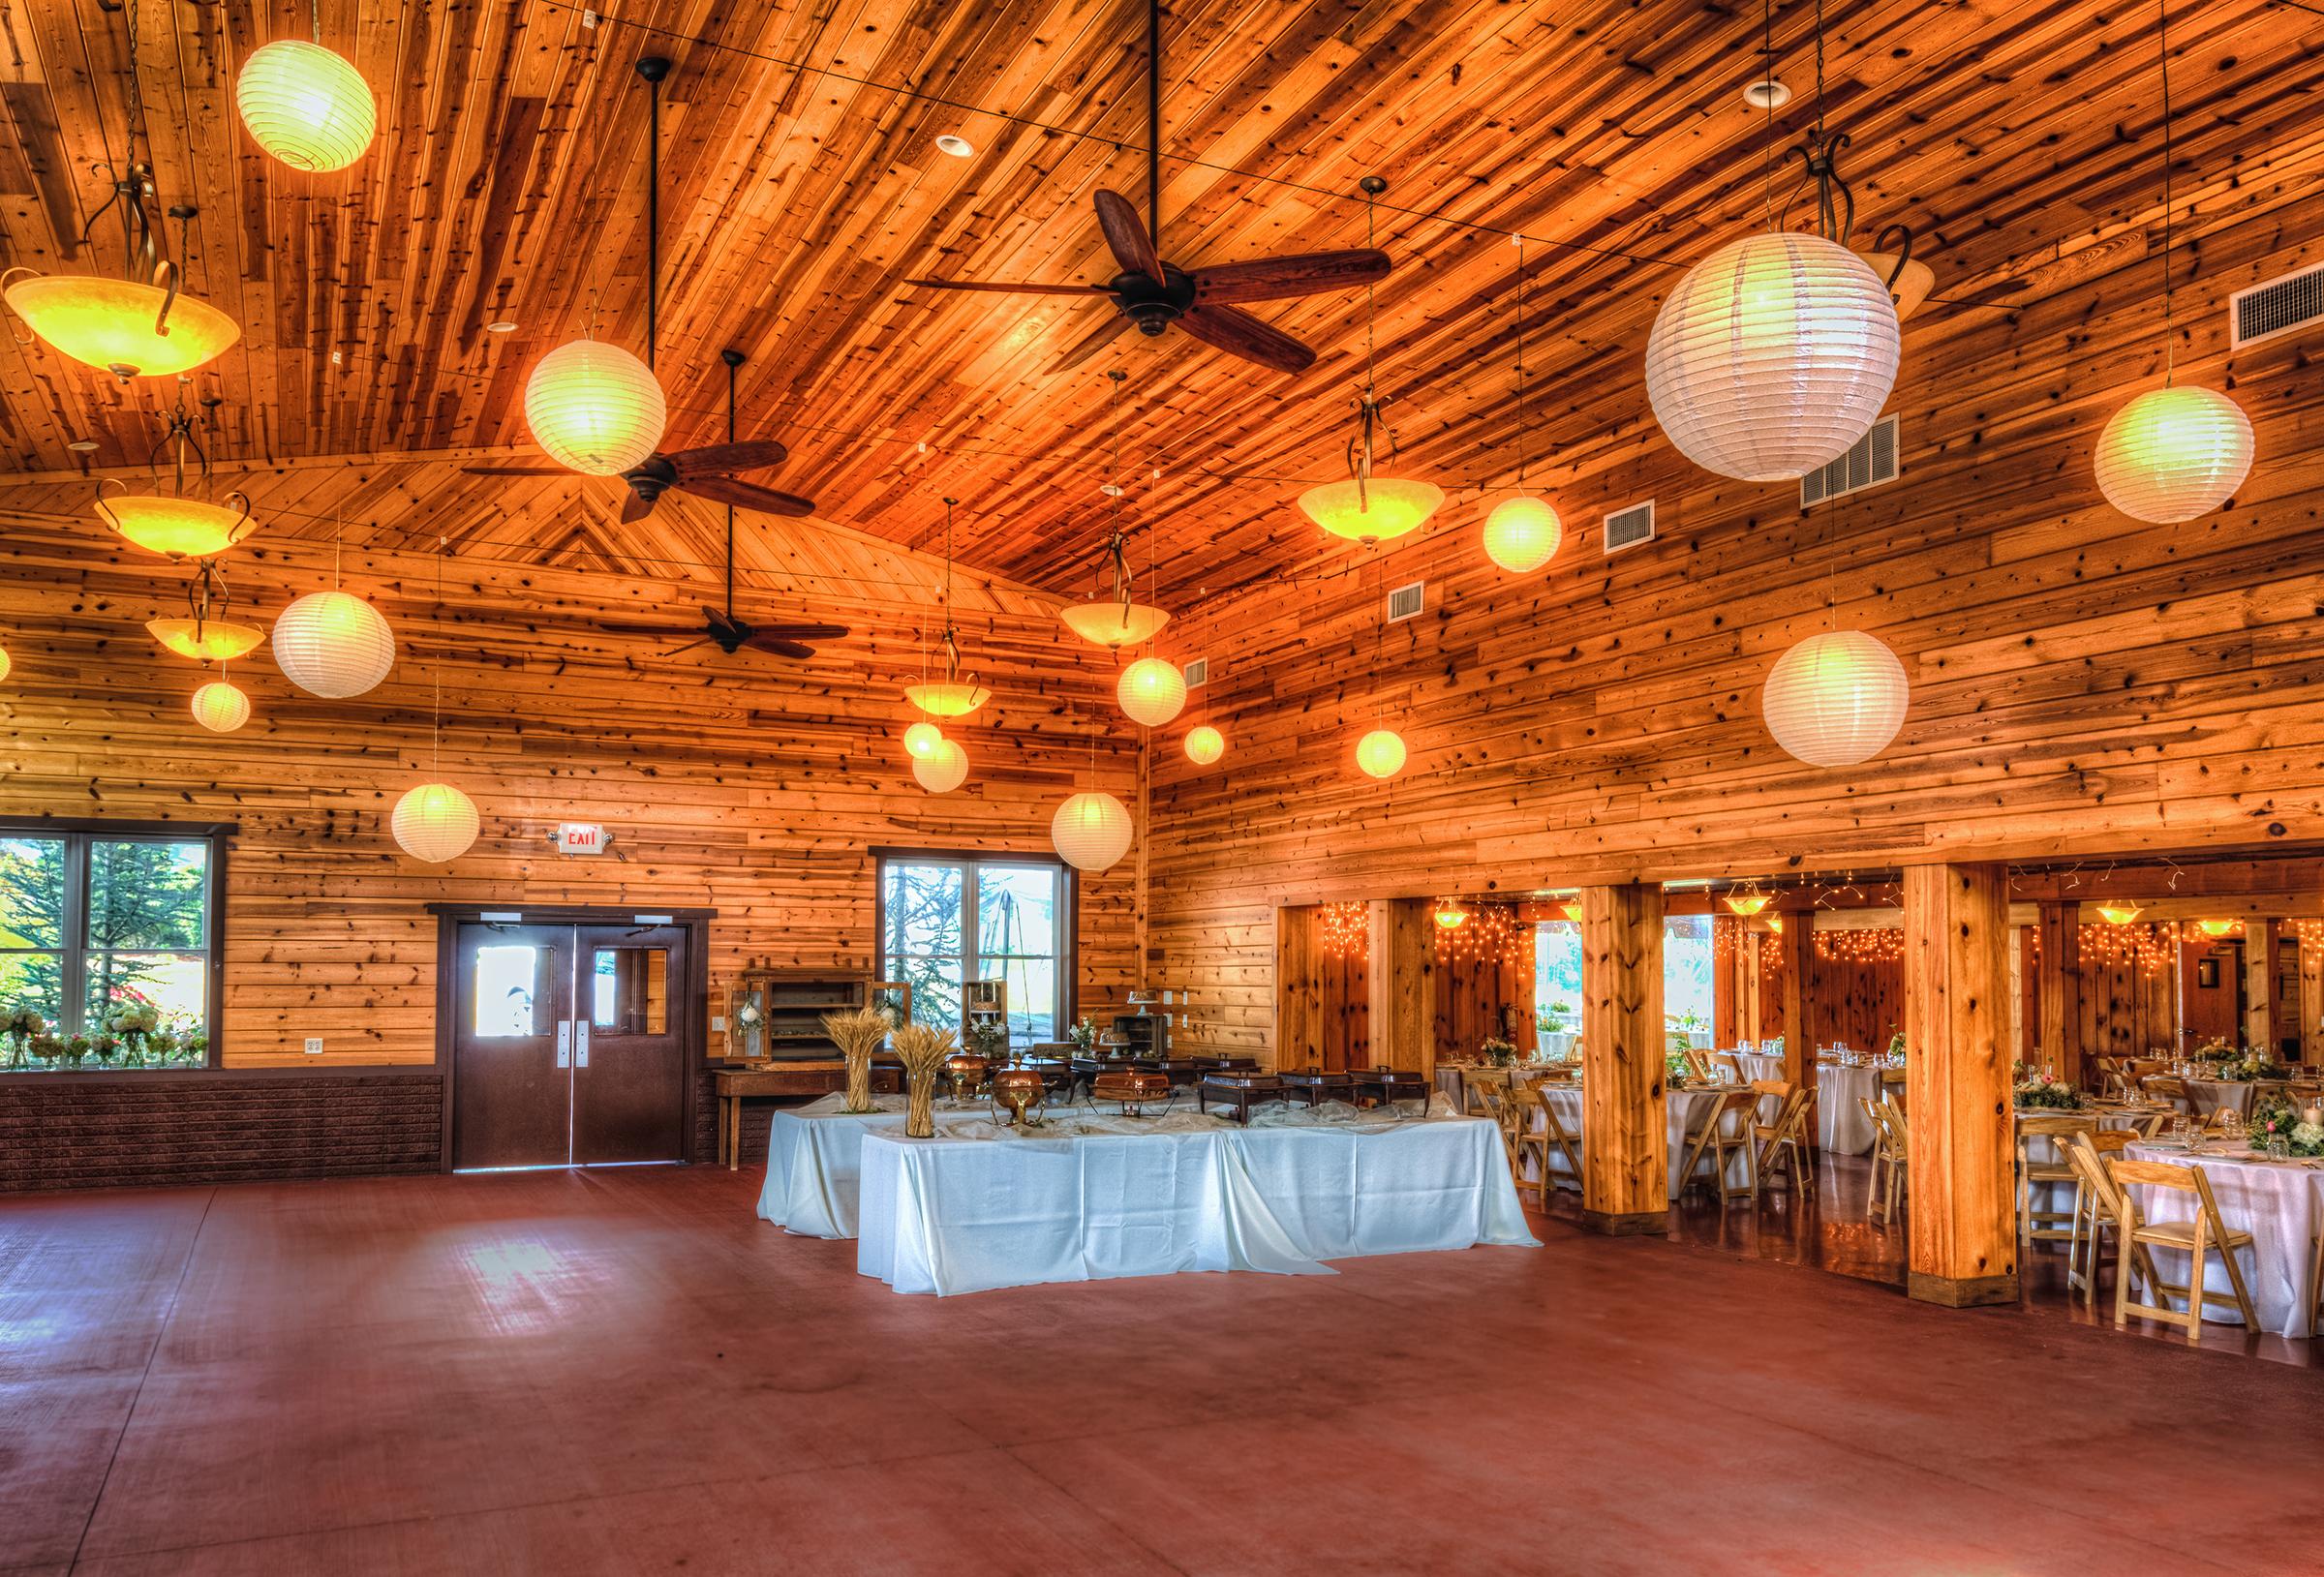 Barn - Interior